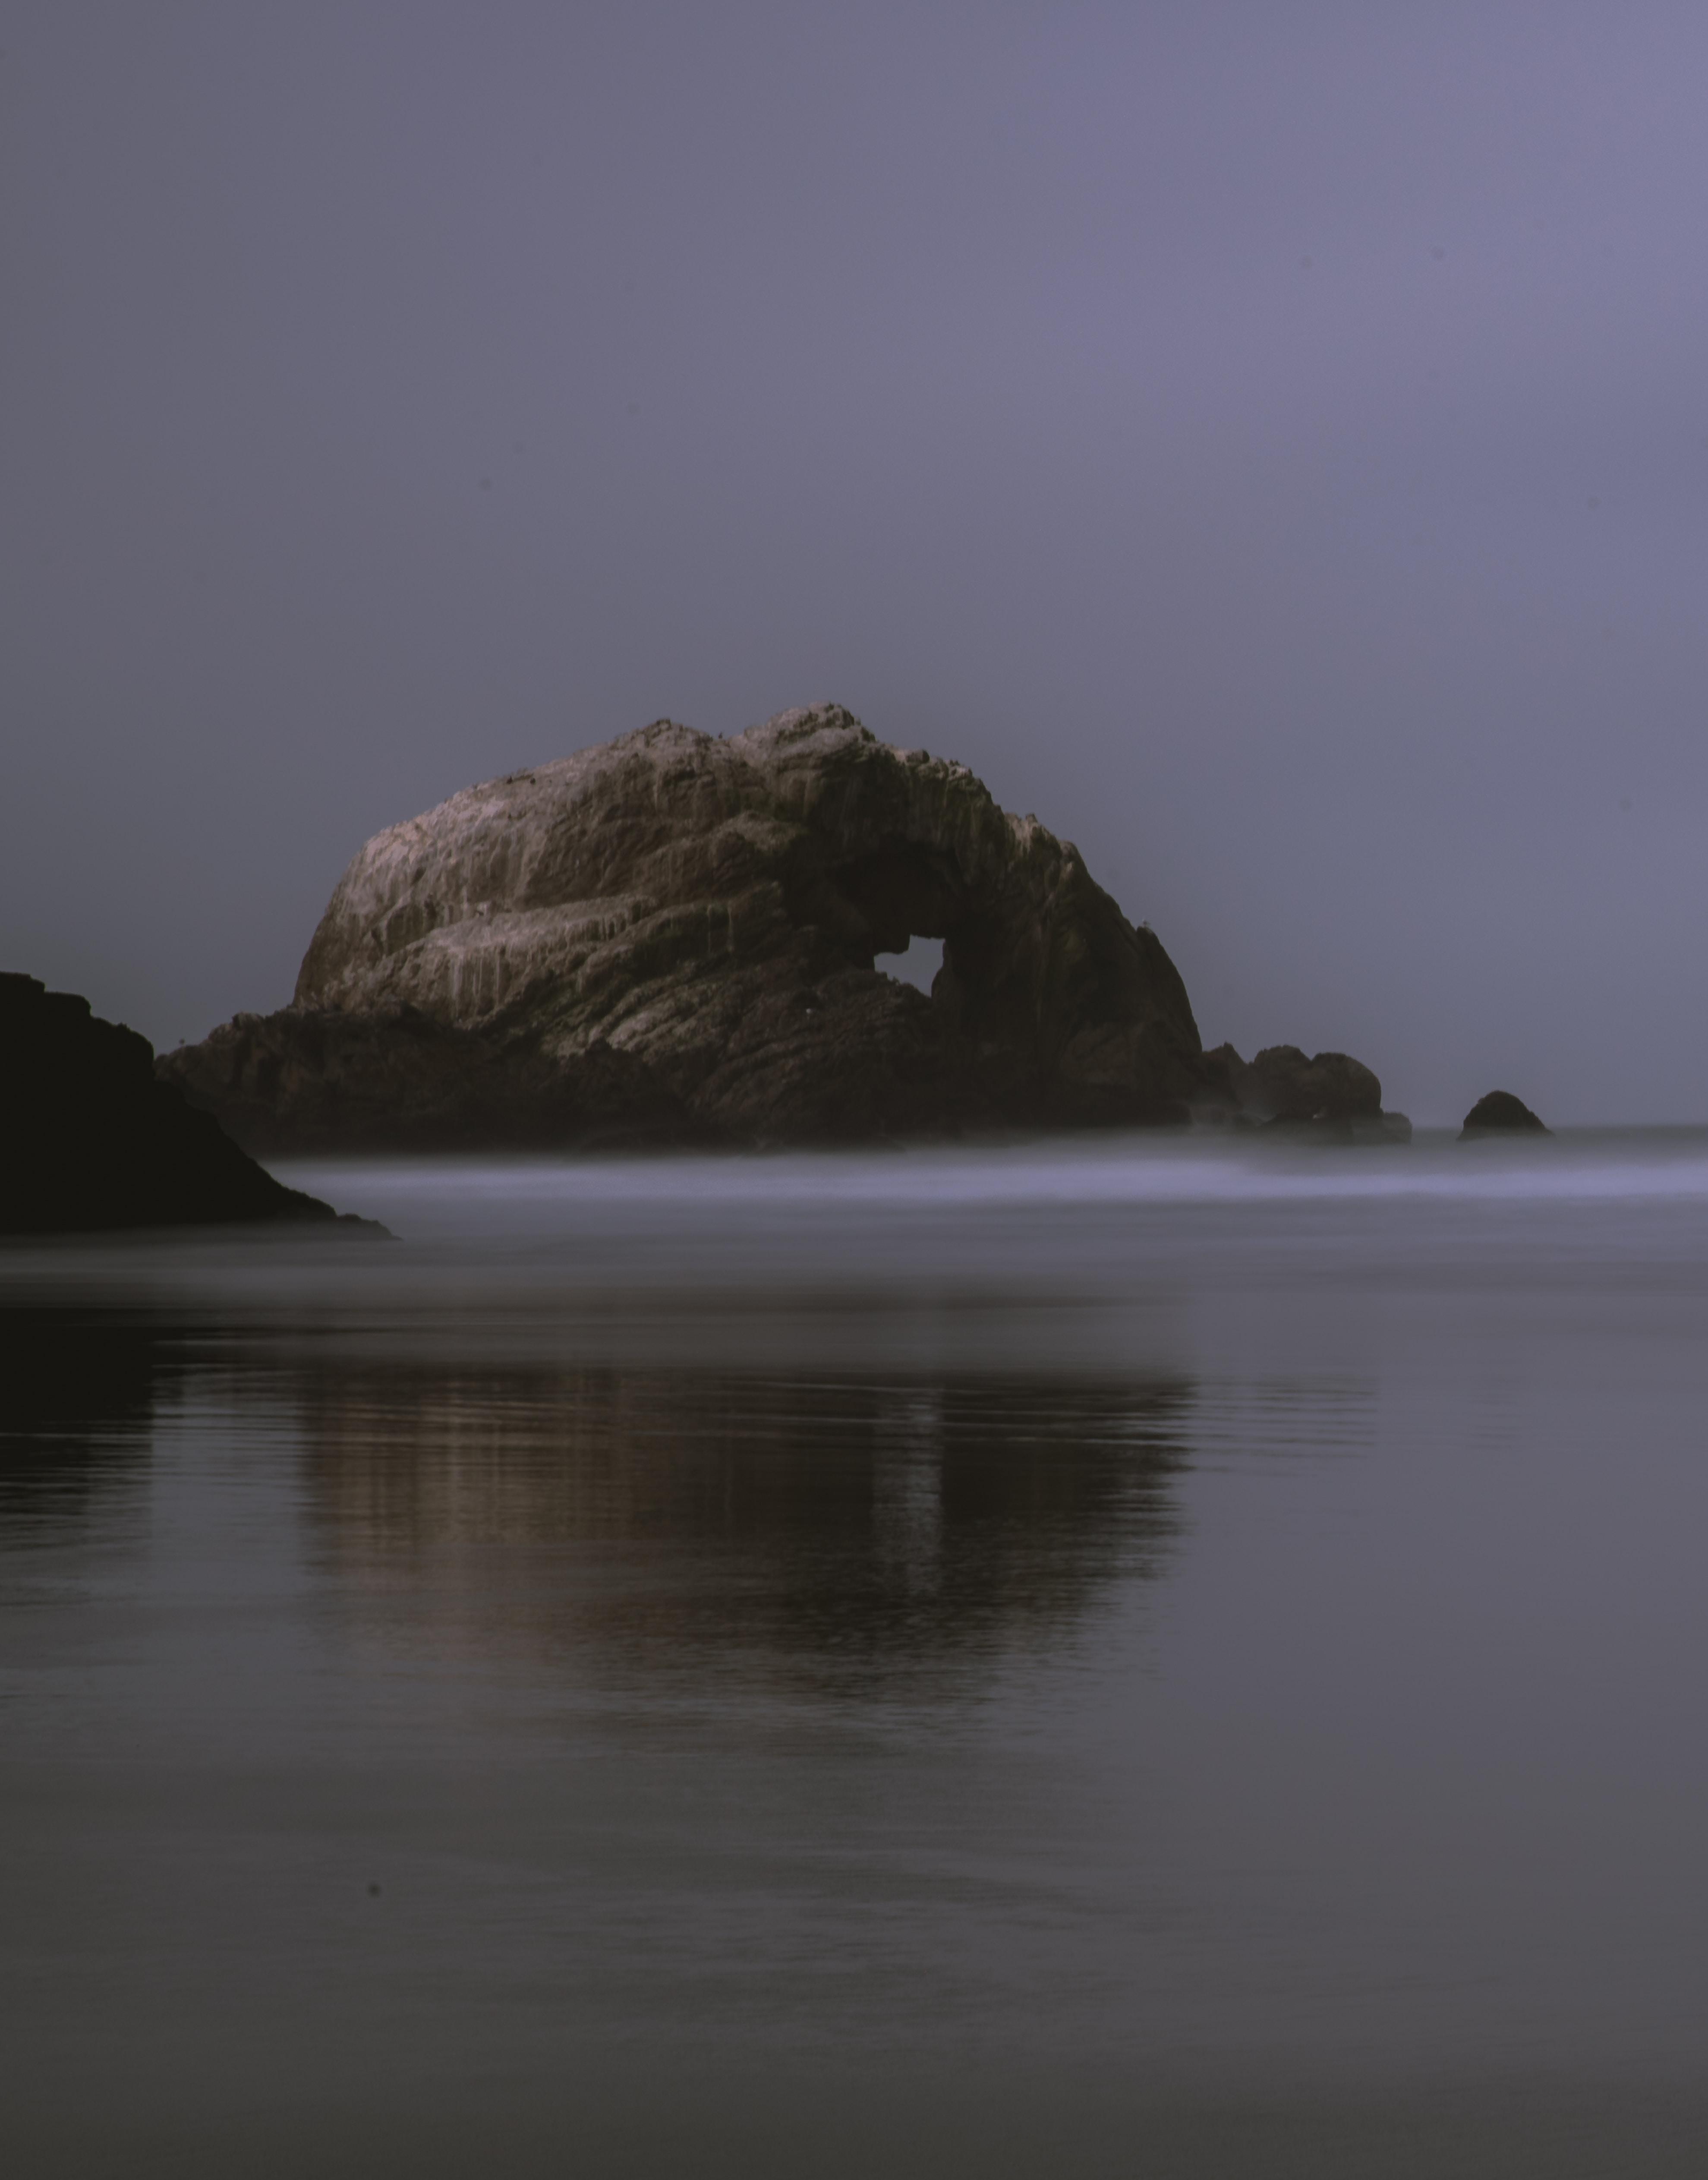 rock formation under gray sky